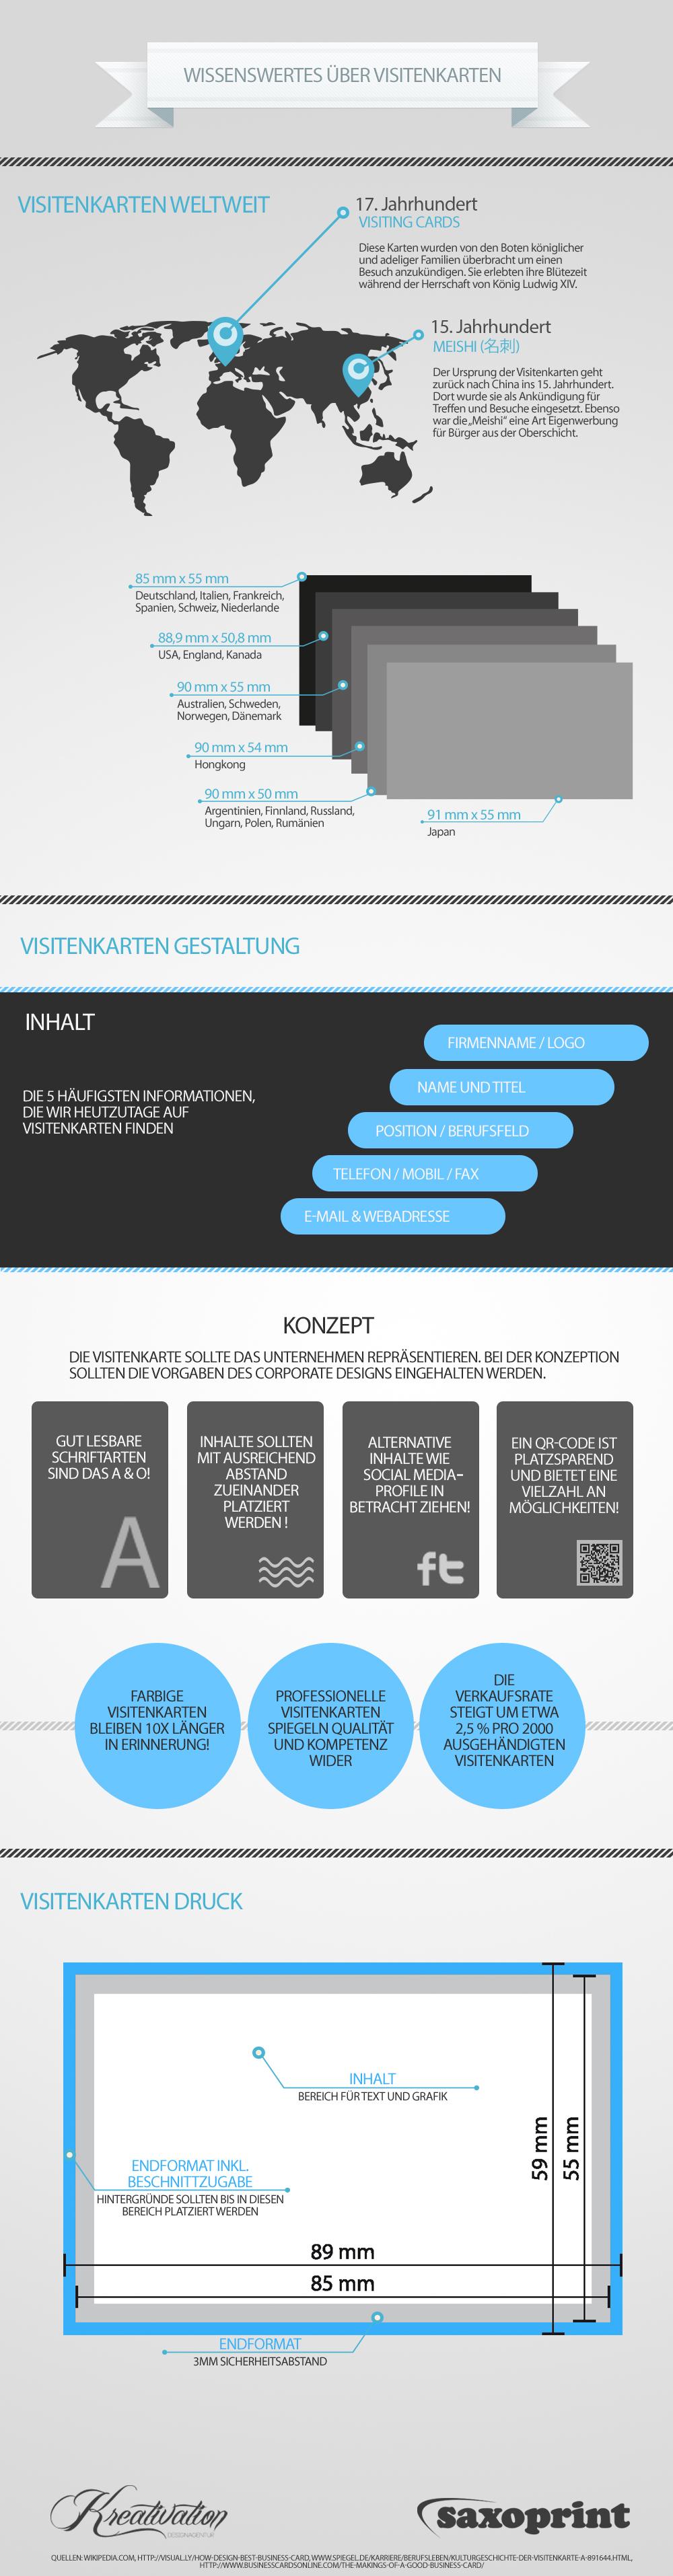 Infografik Zum Thema Visitenkarten Erstellen Saxoprint Blog